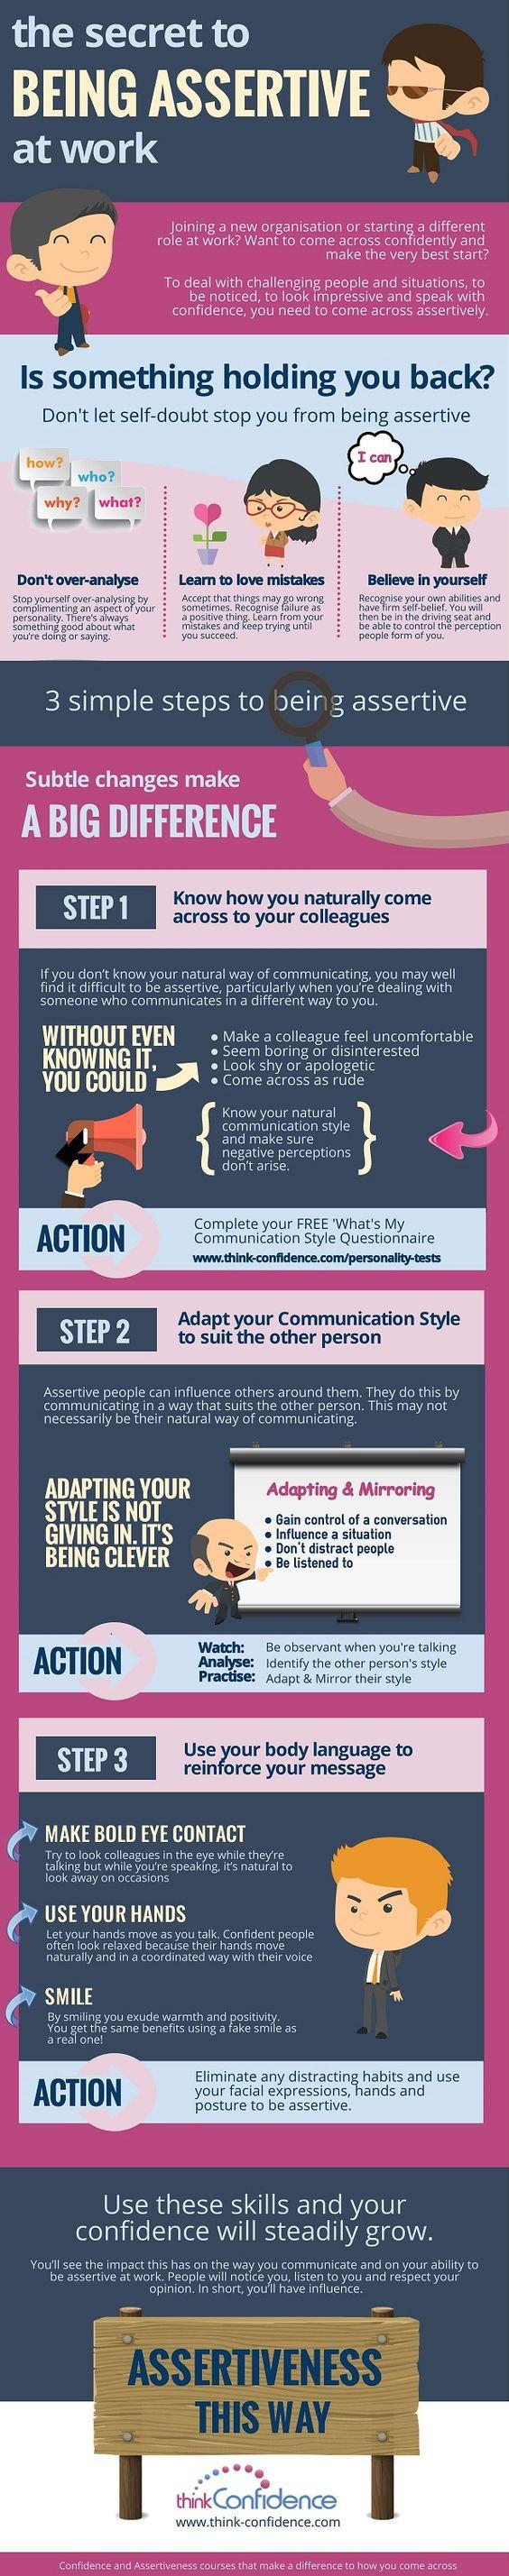 be more aggressive at work